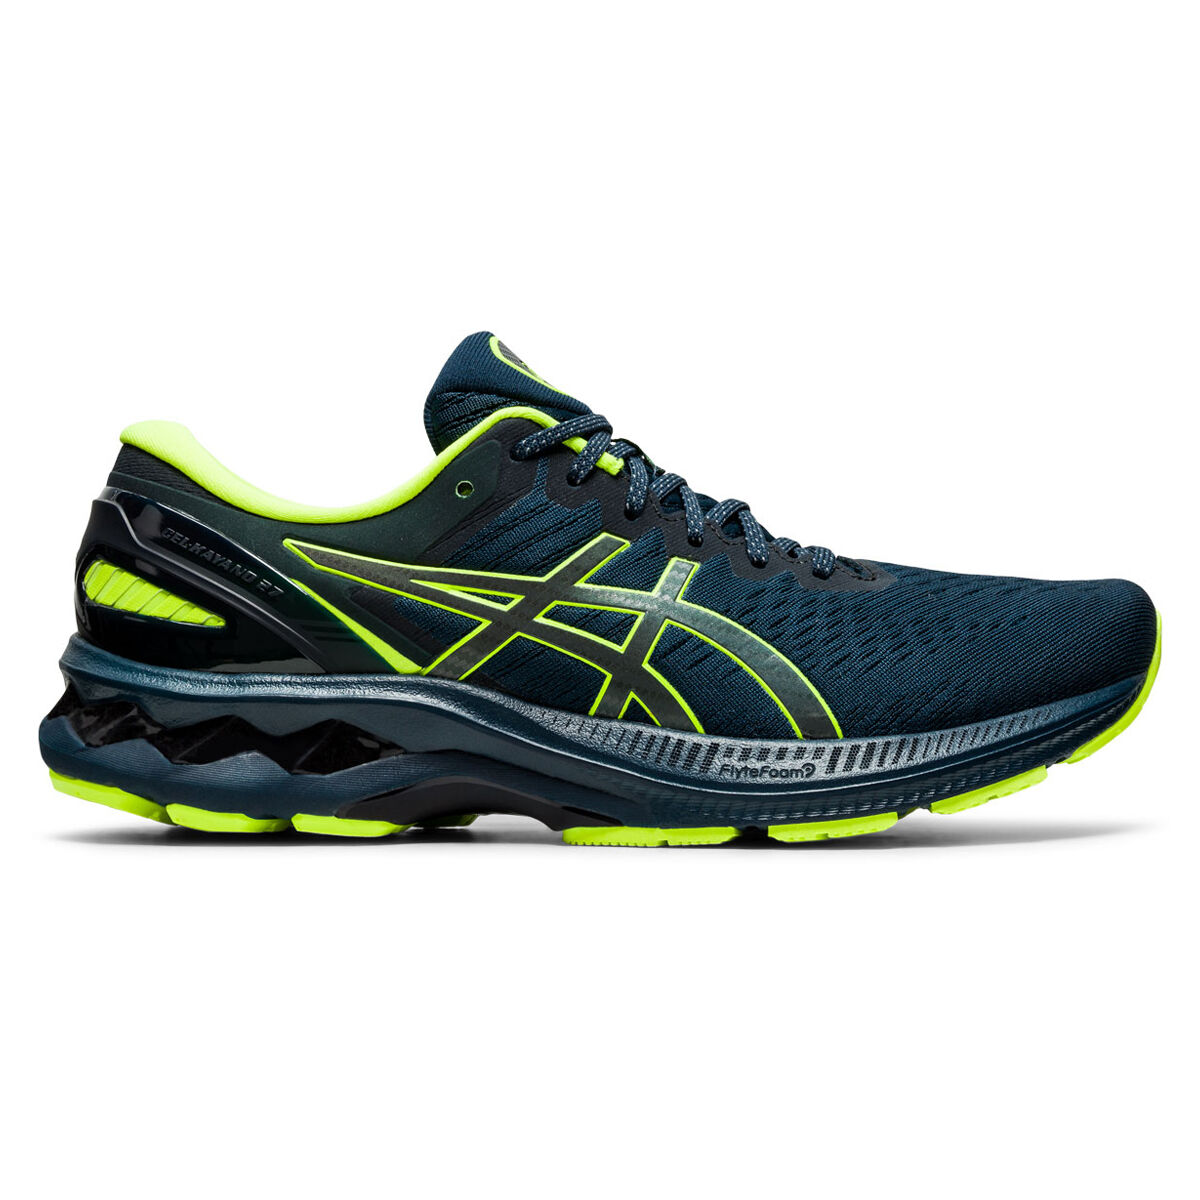 nike id running band for sale california coast   Asics GEL Kayano 27 Lite Show Mens Running Shoes